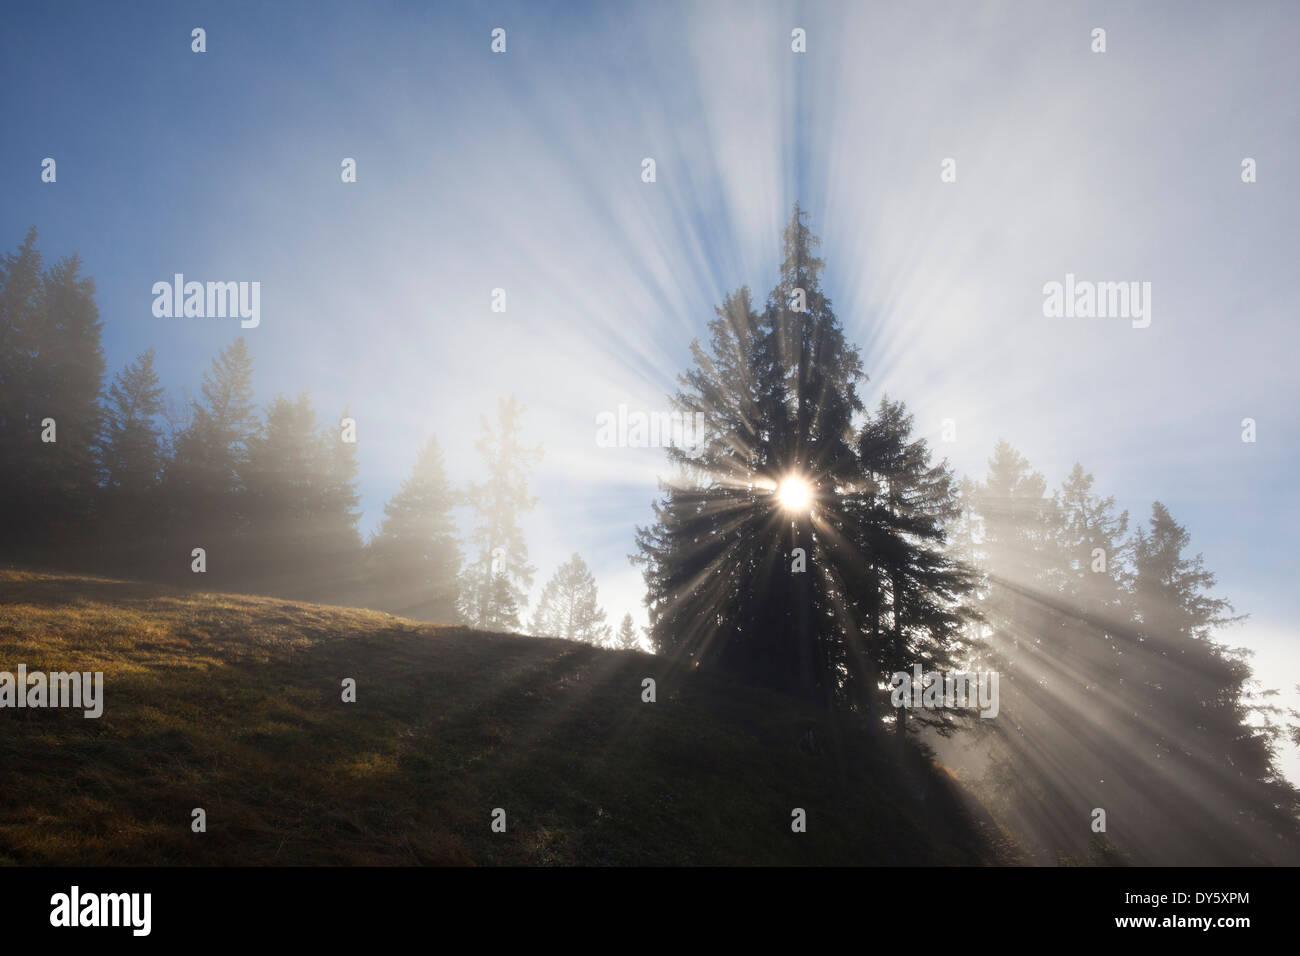 Spruces in the fog, Berchtesgaden region, Berchtesgaden National Park, Upper Bavaria, Germany, Europe - Stock Image